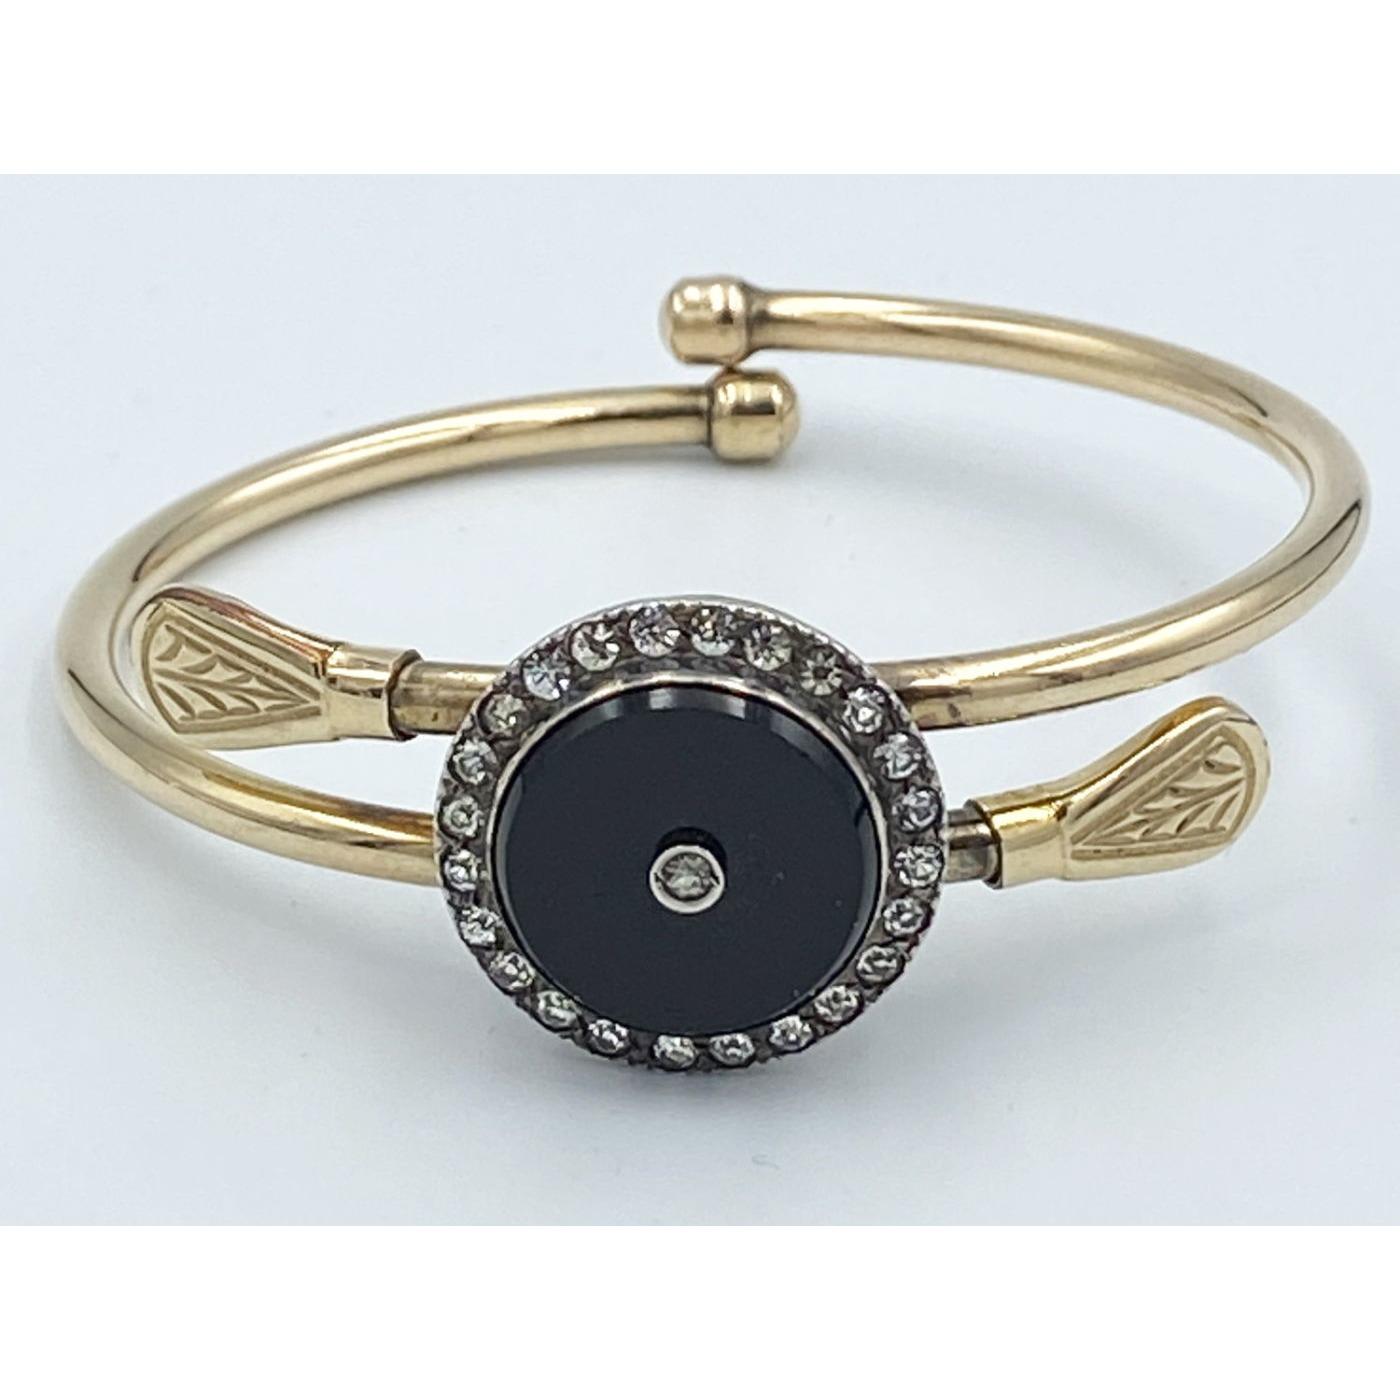 Central Black Stone Gold-filled Bypass Bracelet